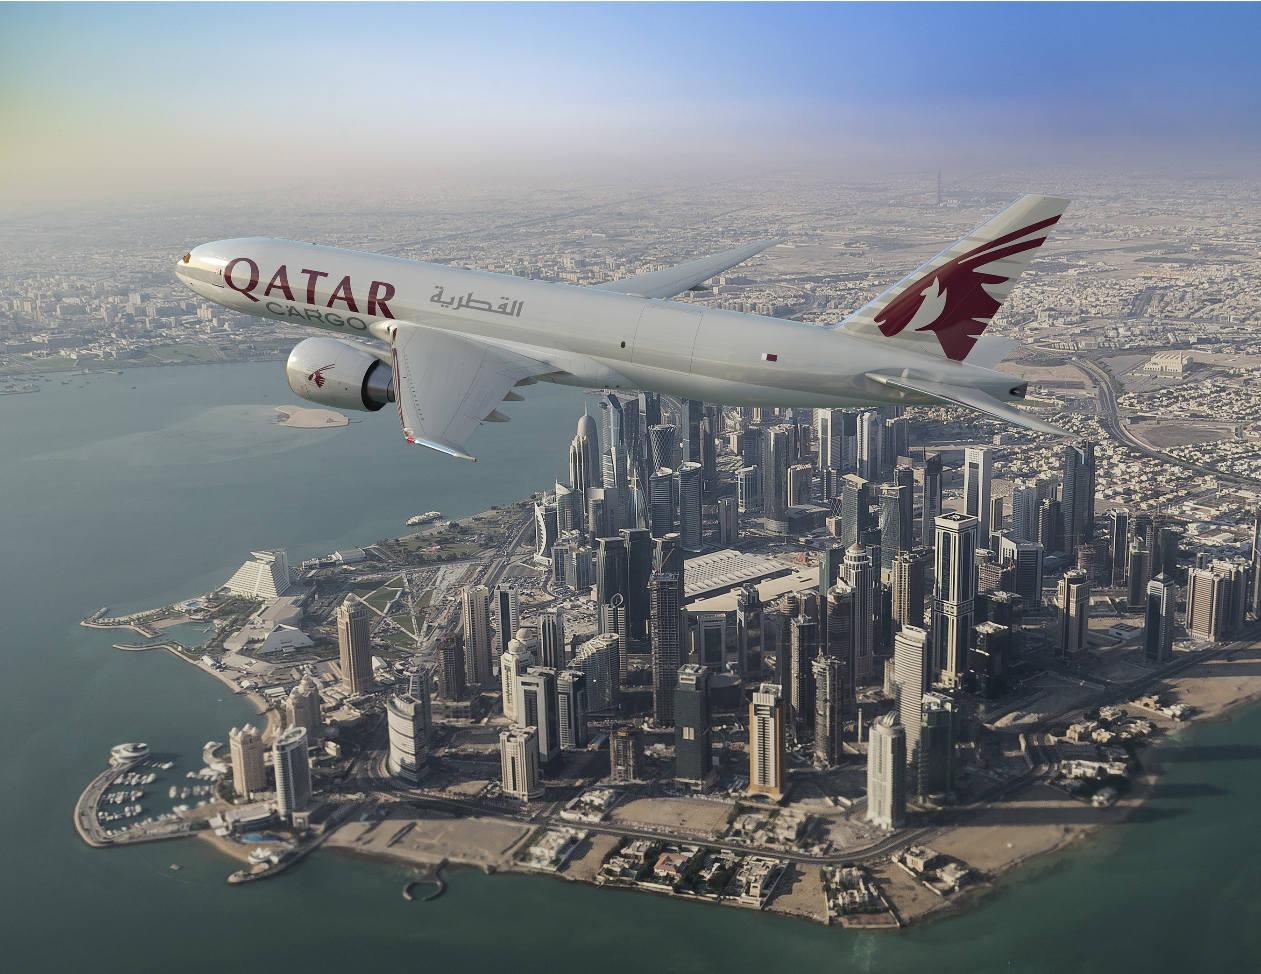 Qatar Airways remporte une manche face au blocus aérien